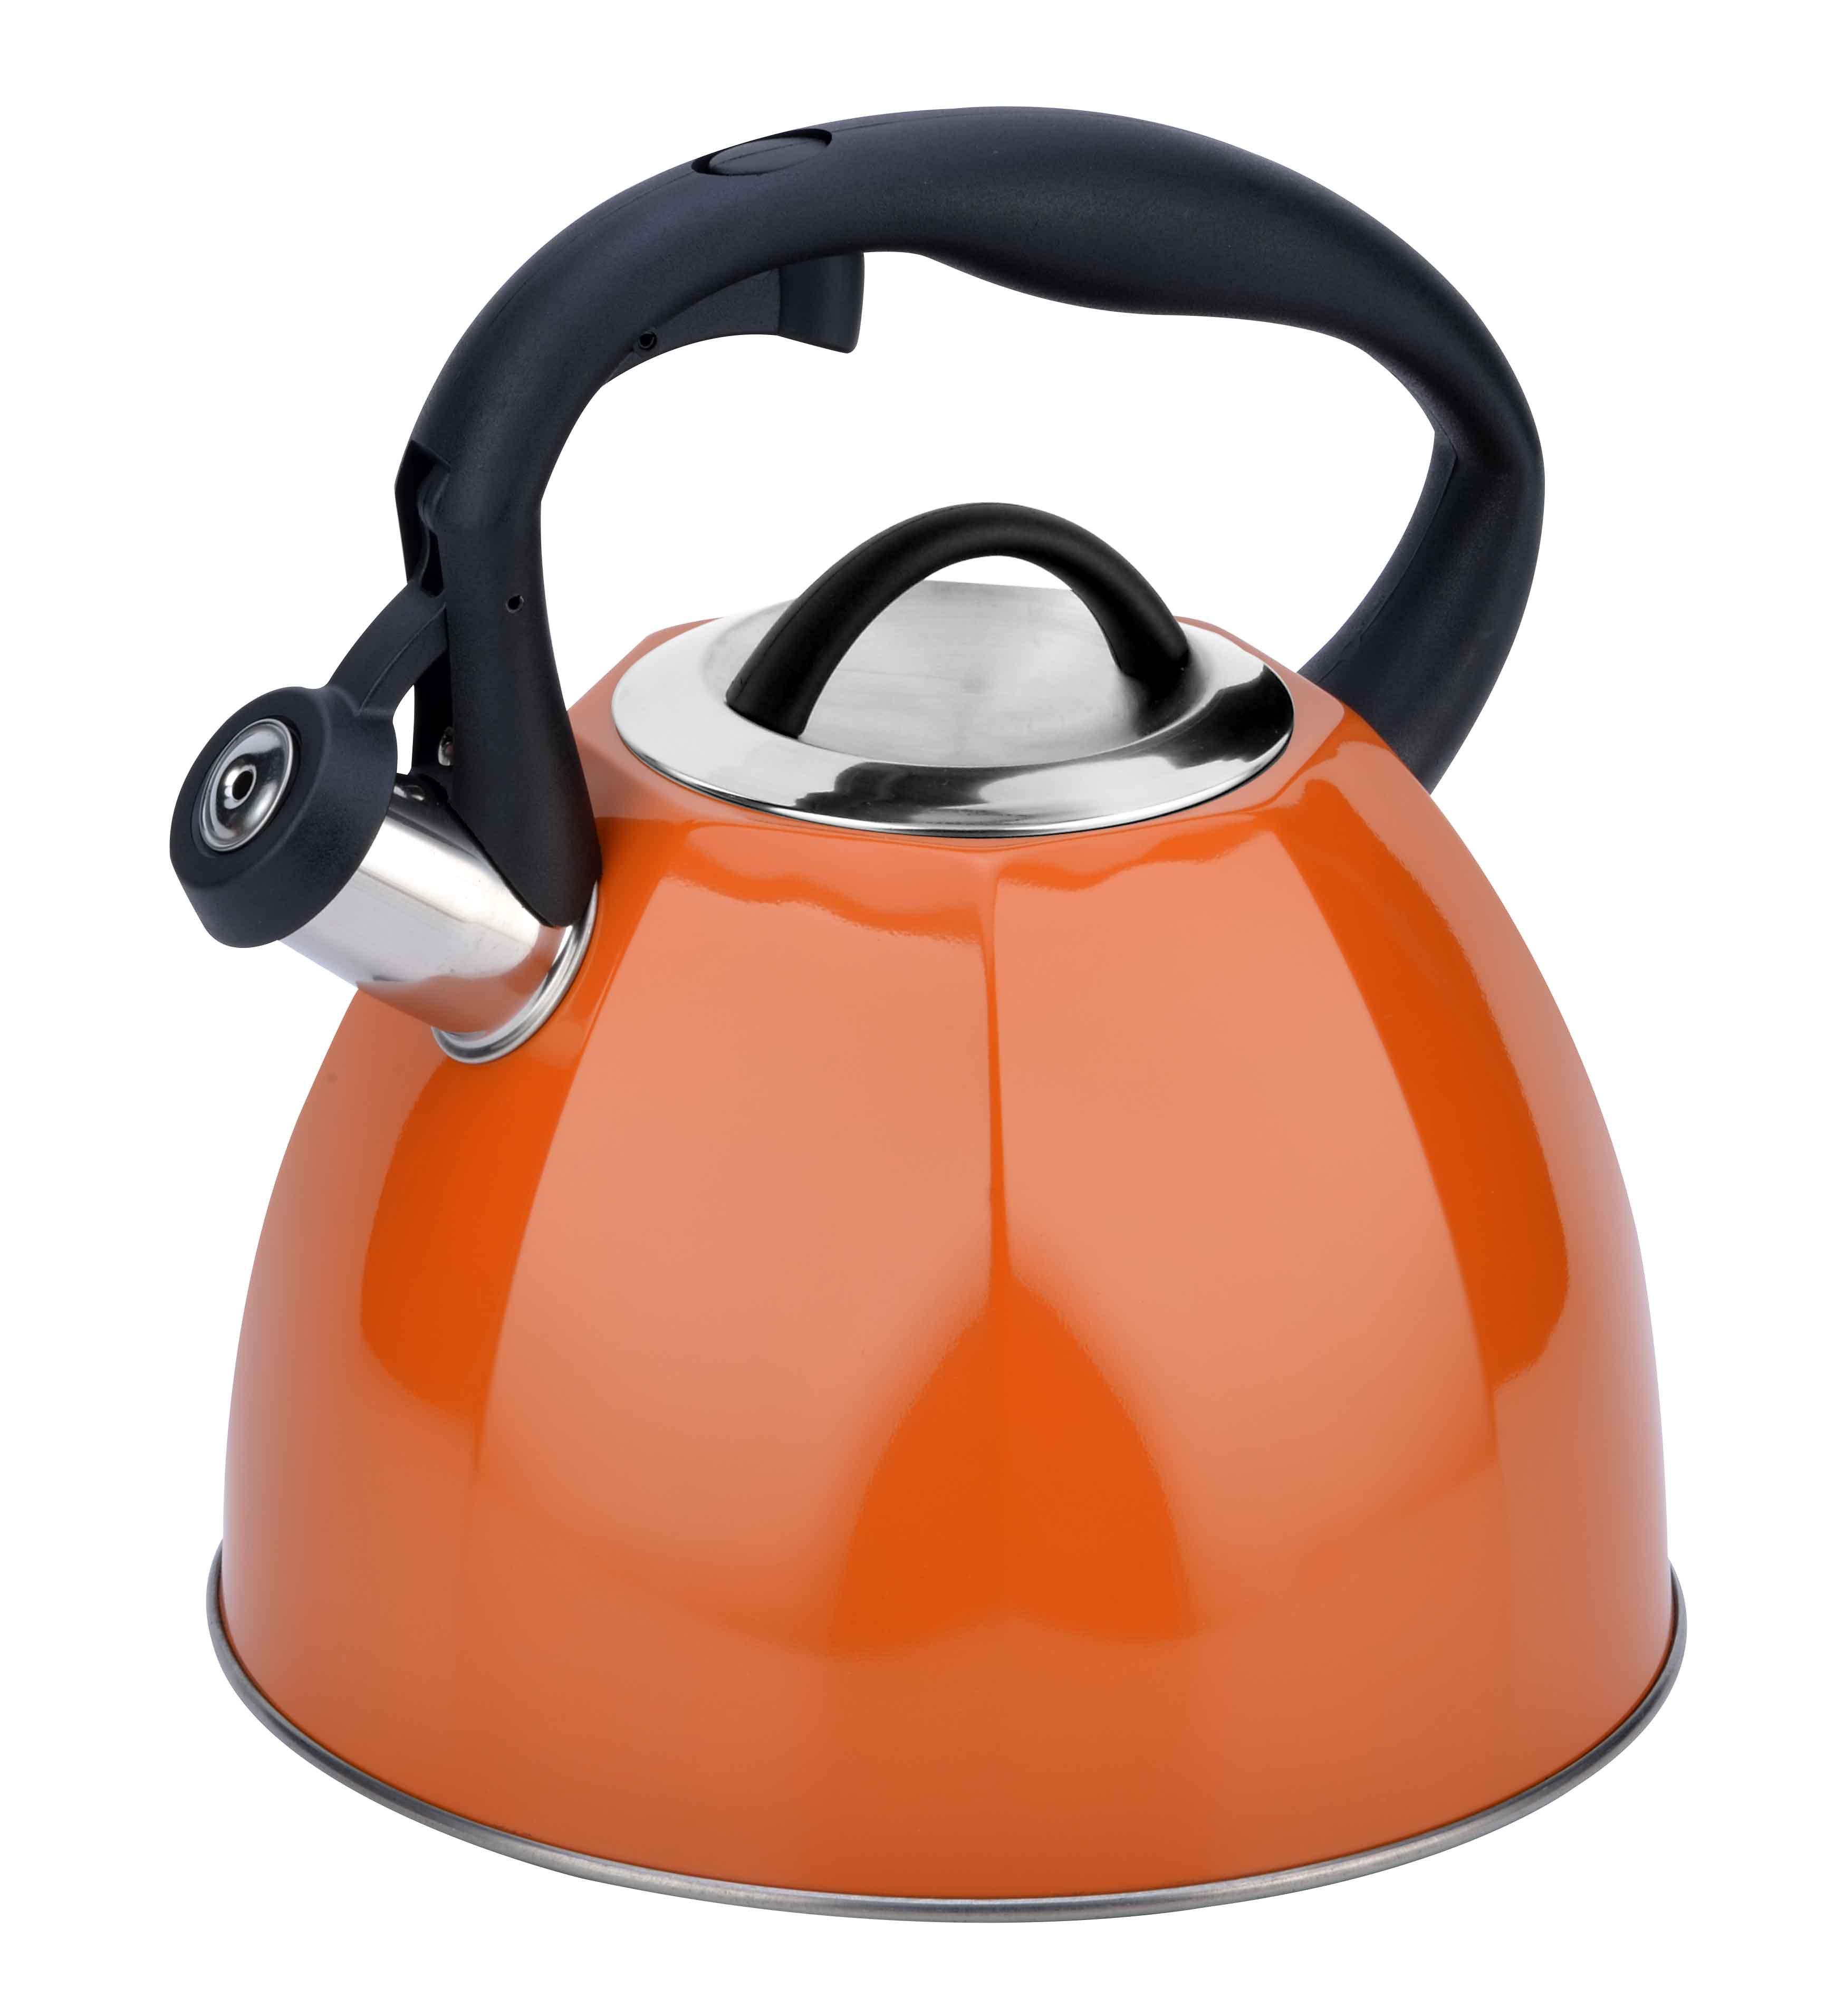 3.5Litre octagon shape tea pot